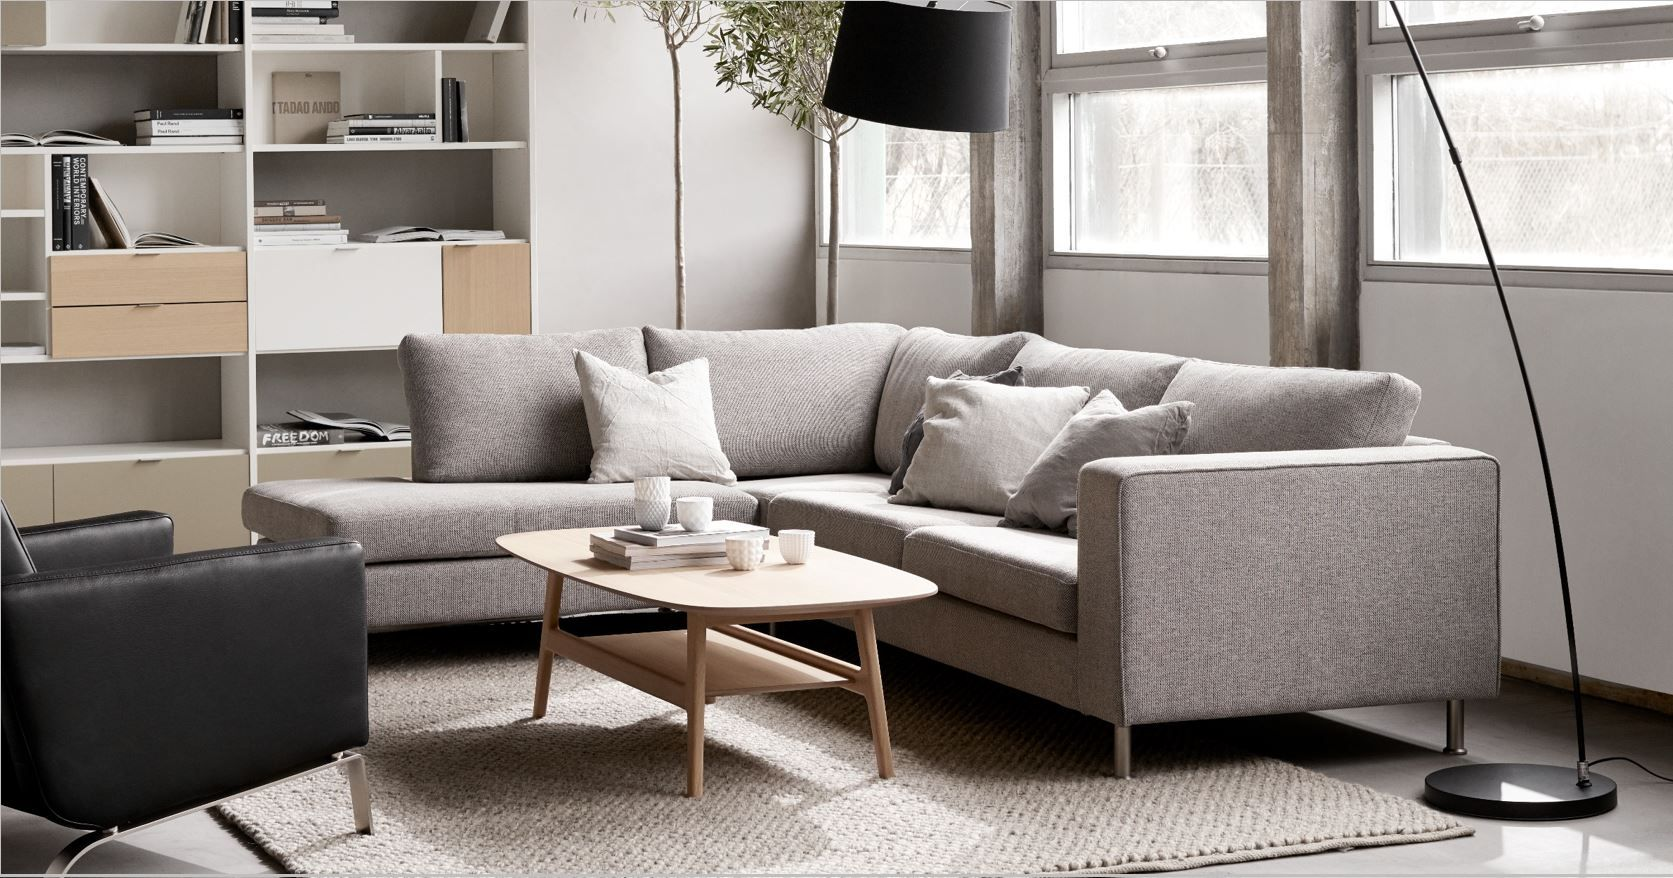 Sofas Hannover boconcept hannover ein sofa für alle indivi 2 http boconcept